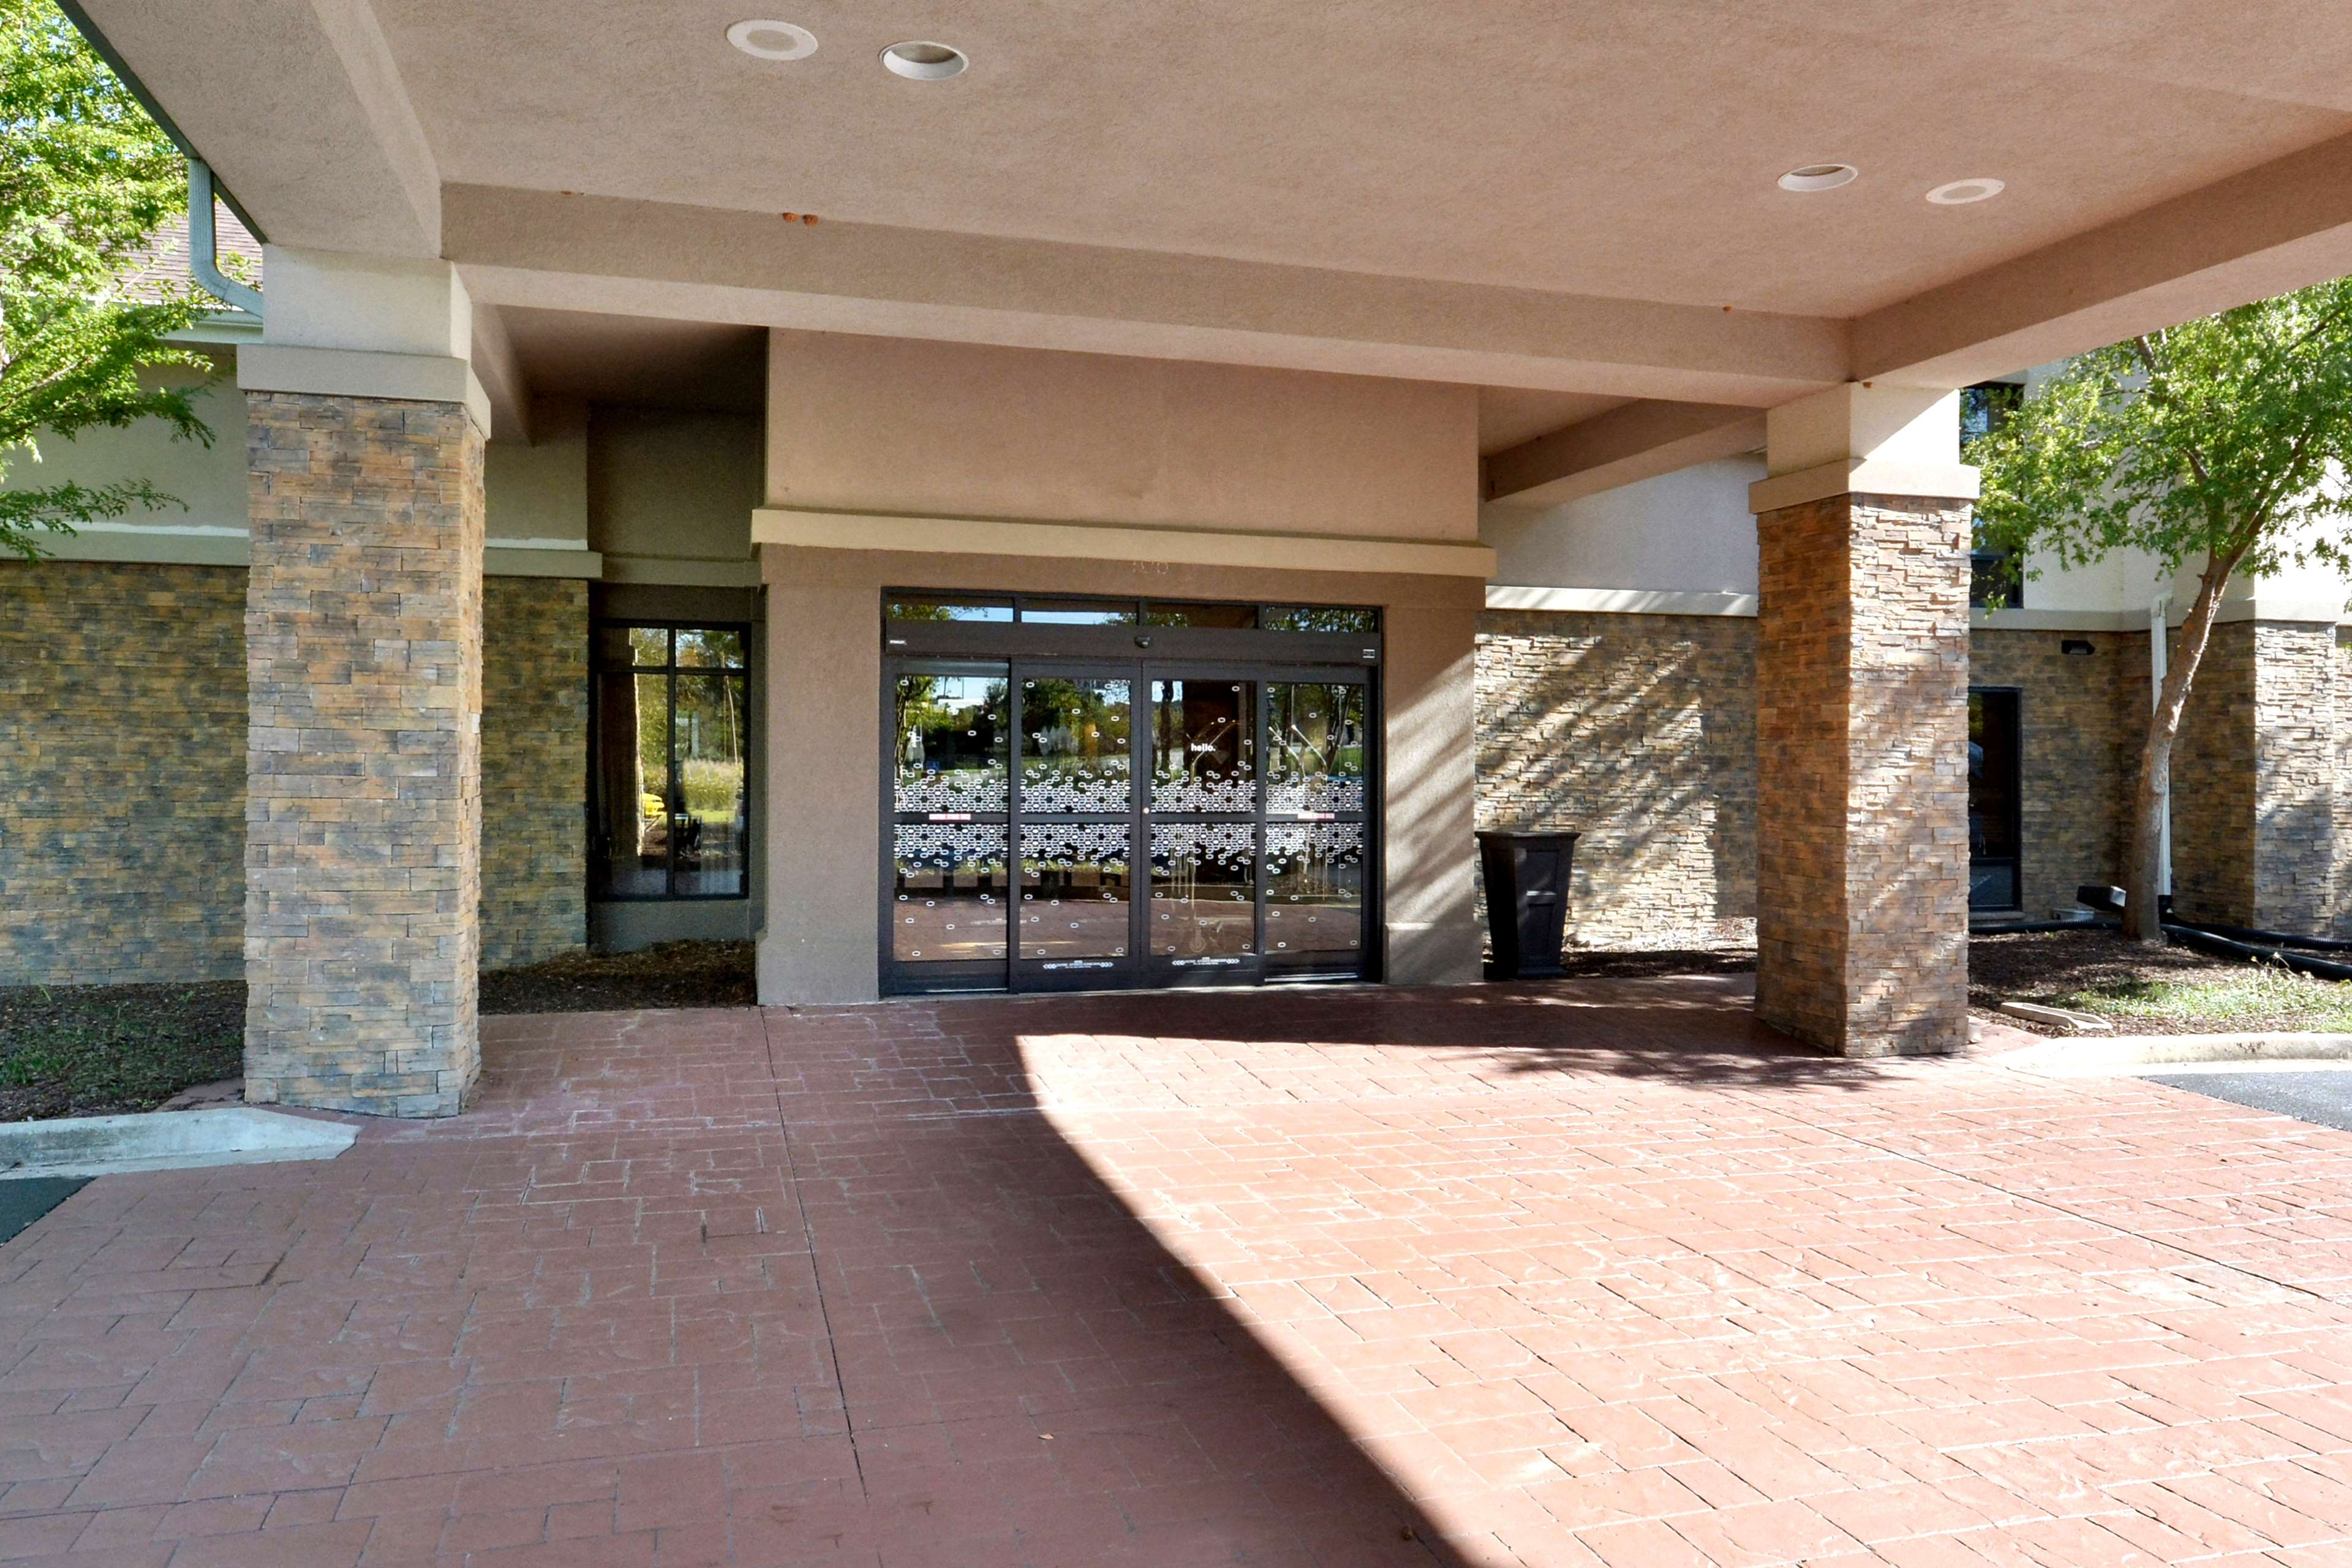 Hampton Inn & Suites Greenville/Spartanburg I-85 image 6